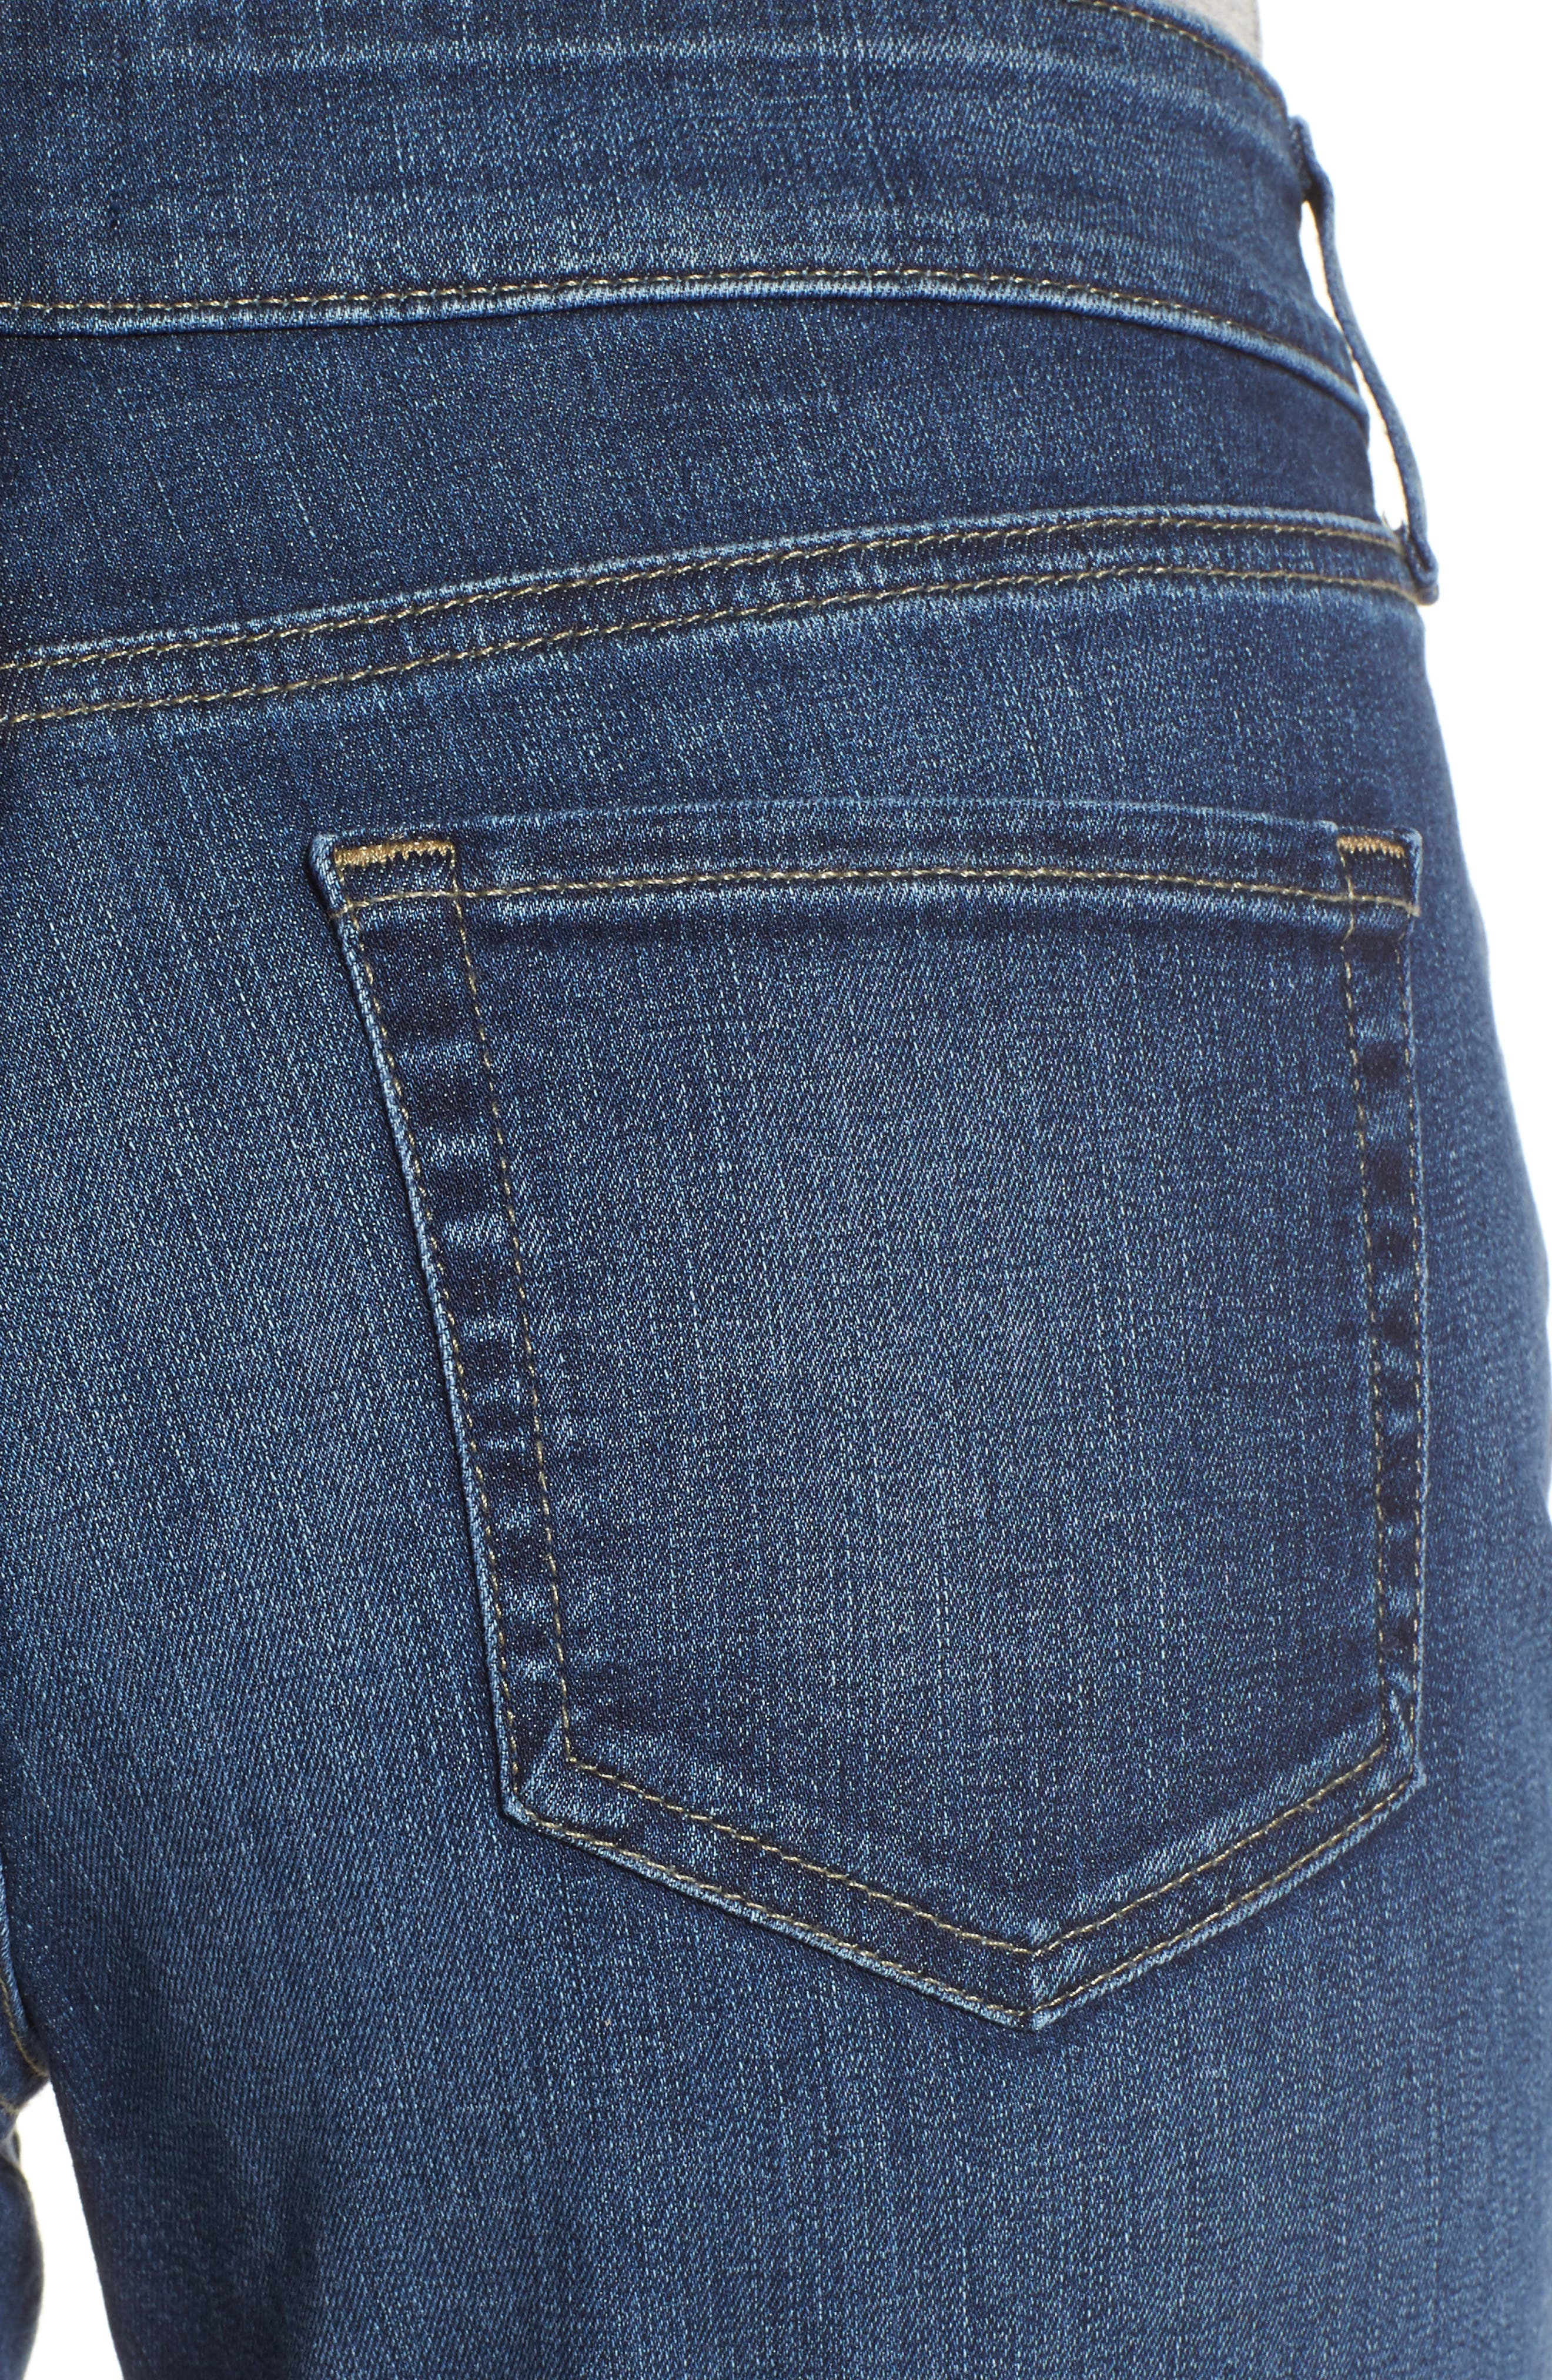 Stretch Boyfriend Jeans,                             Alternate thumbnail 4, color,                             Pioneer